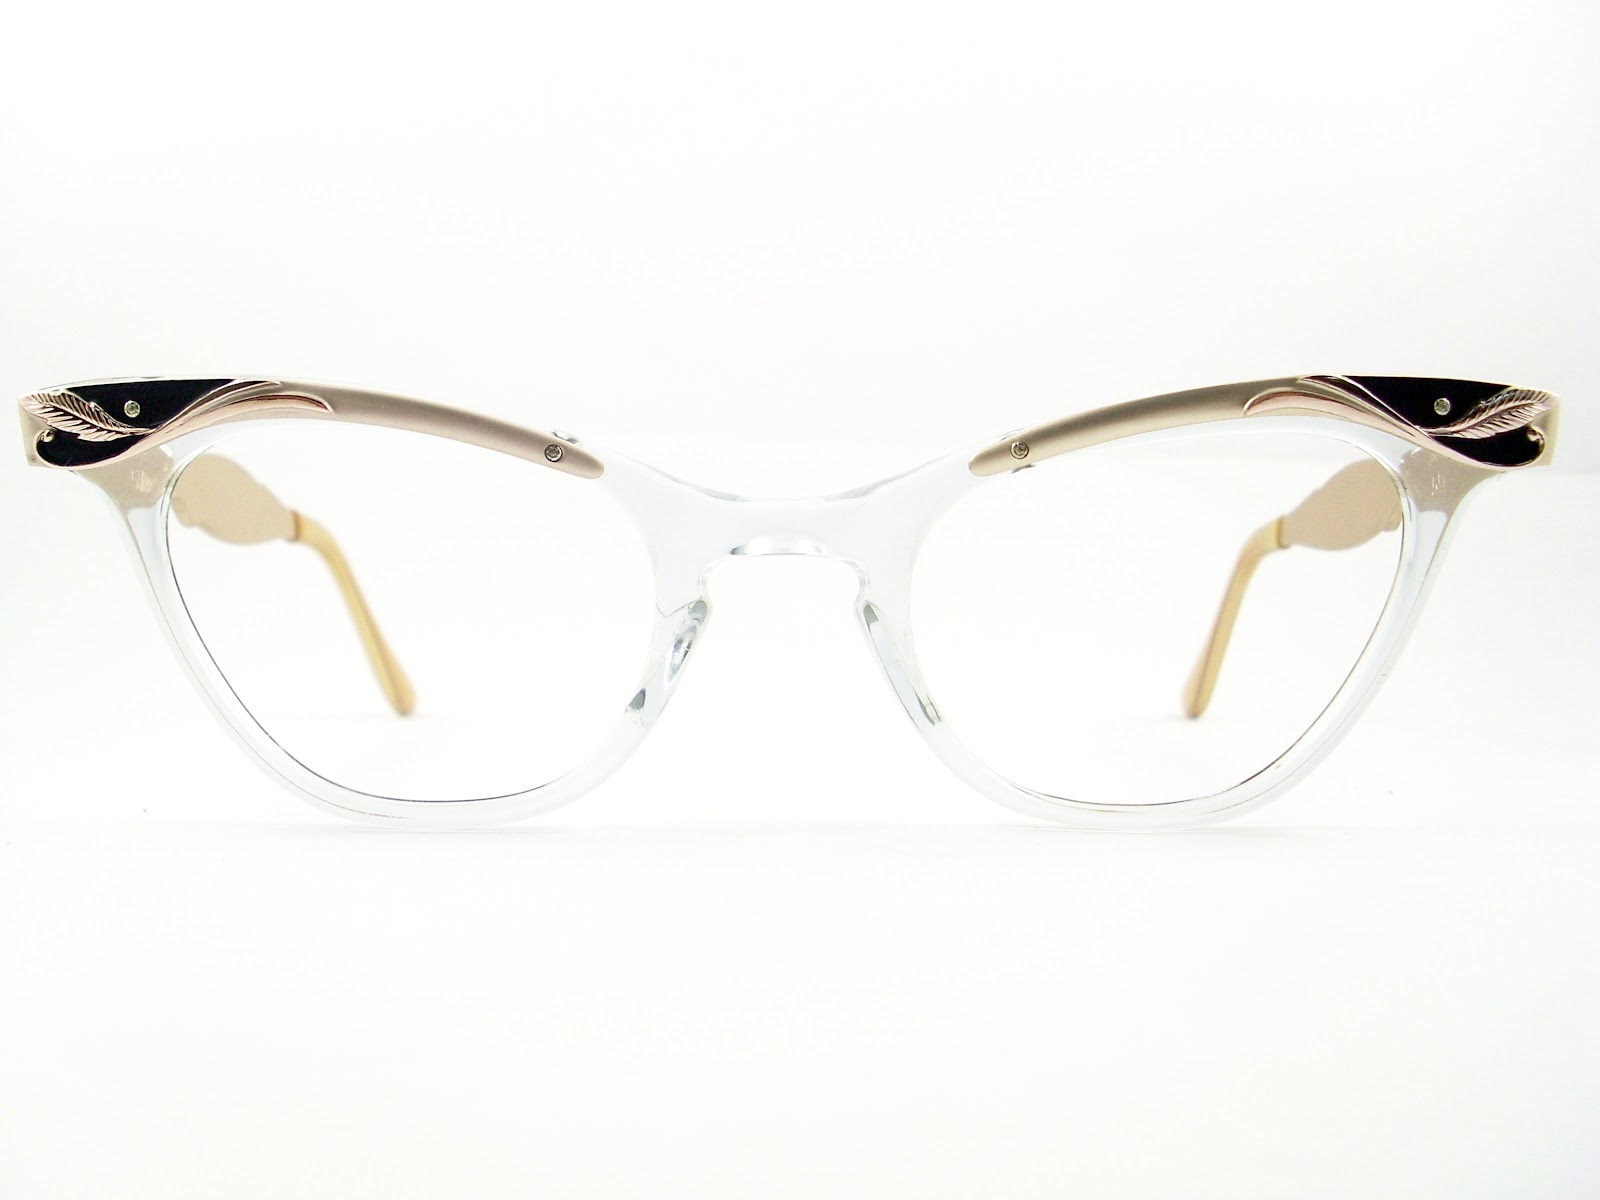 Glasses Frames Cat Eye : Vintage Eyeglasses Frames Eyewear Sunglasses 50S: VINTAGE ...